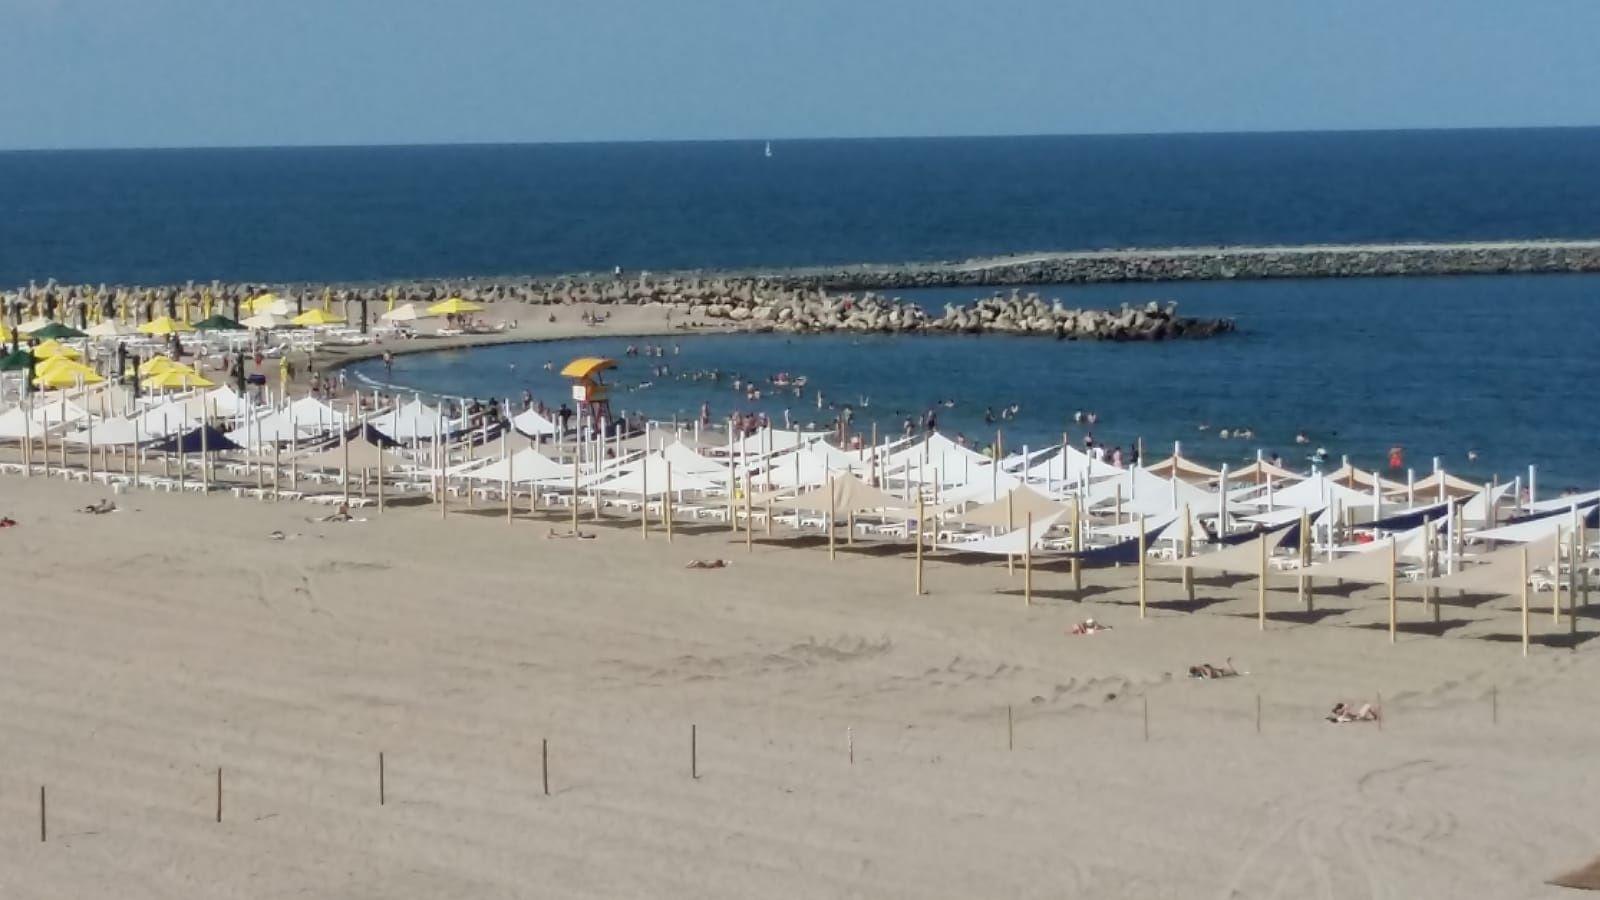 Cazare pe litoral langa plaja !!!